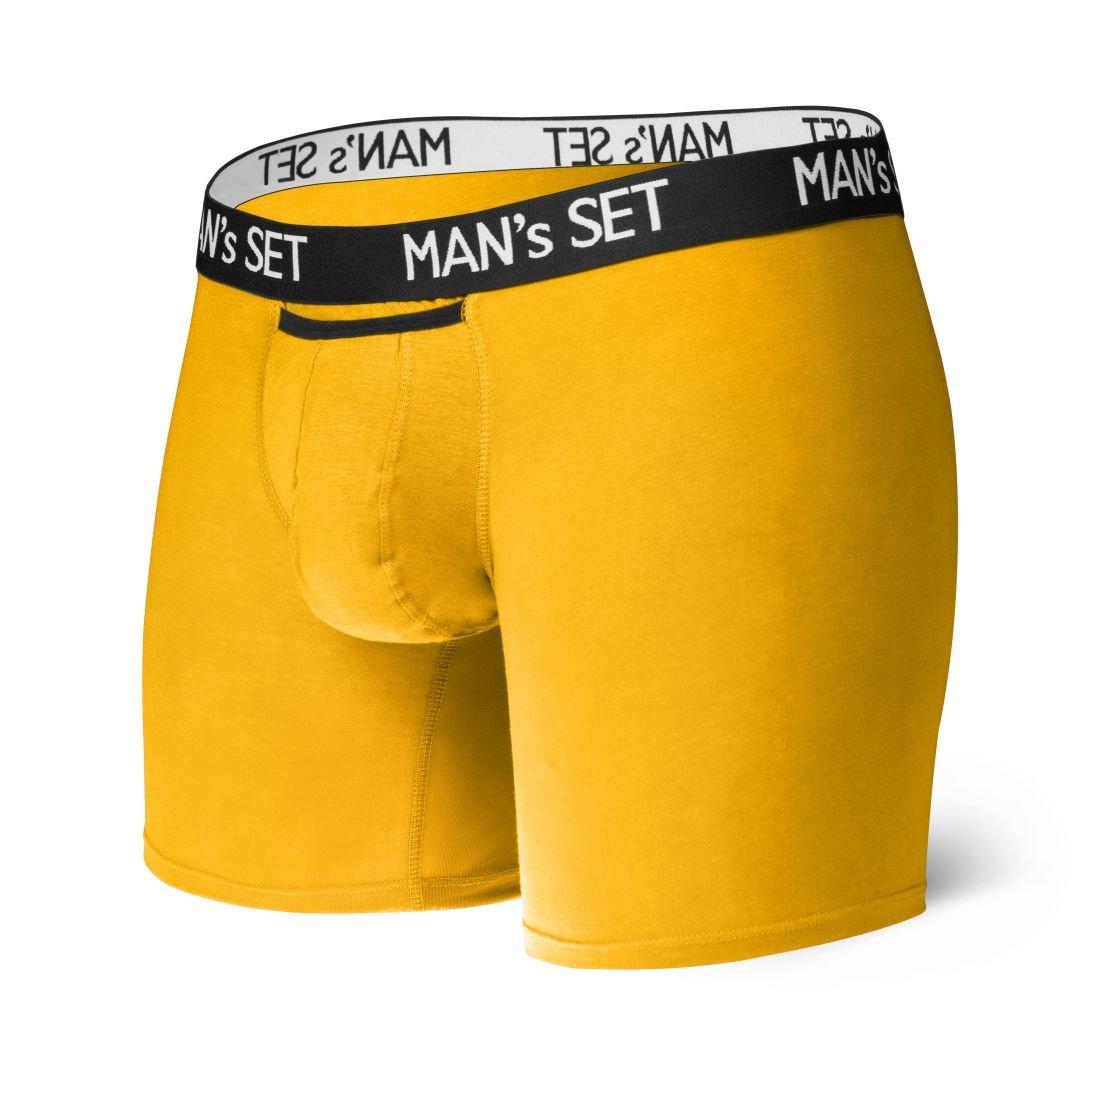 Анатомические боксеры из хлопка Long, желтый MansSet